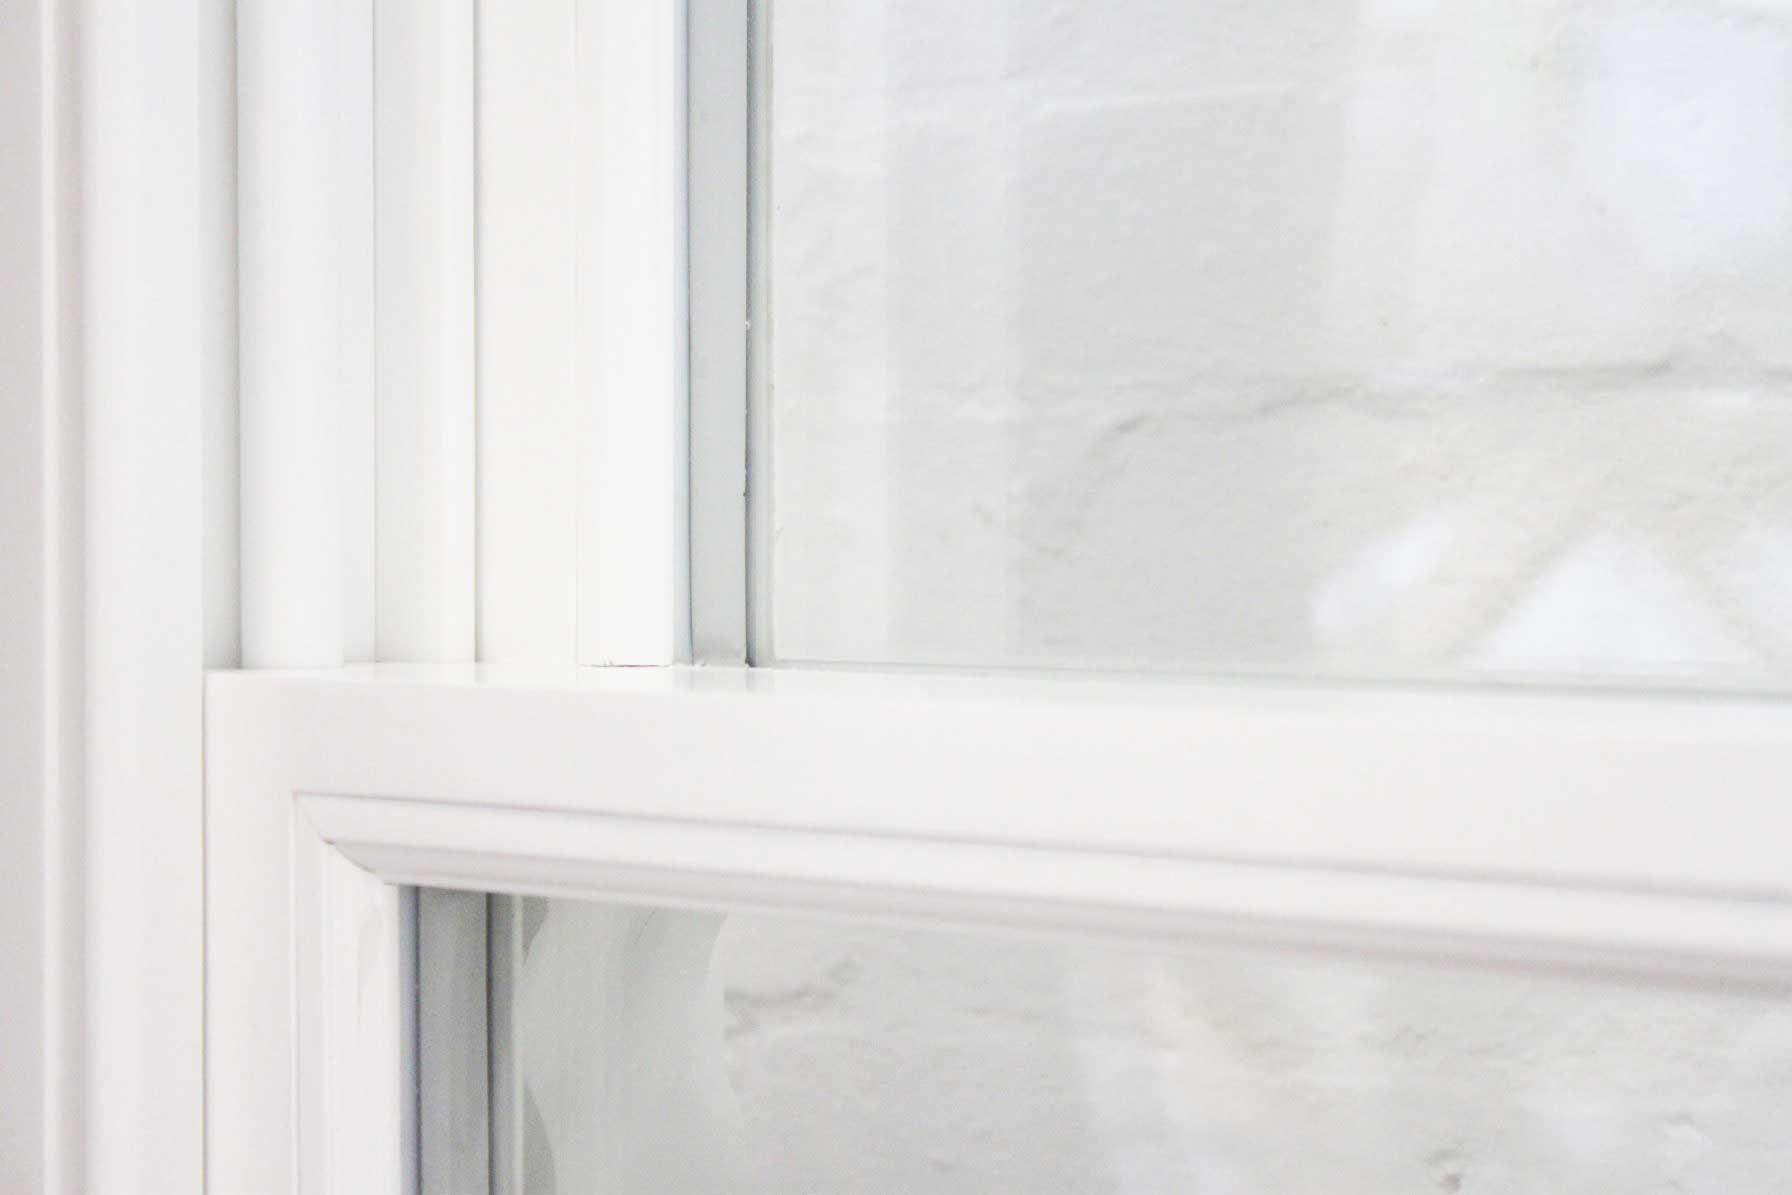 Double glazed sash windows spacer